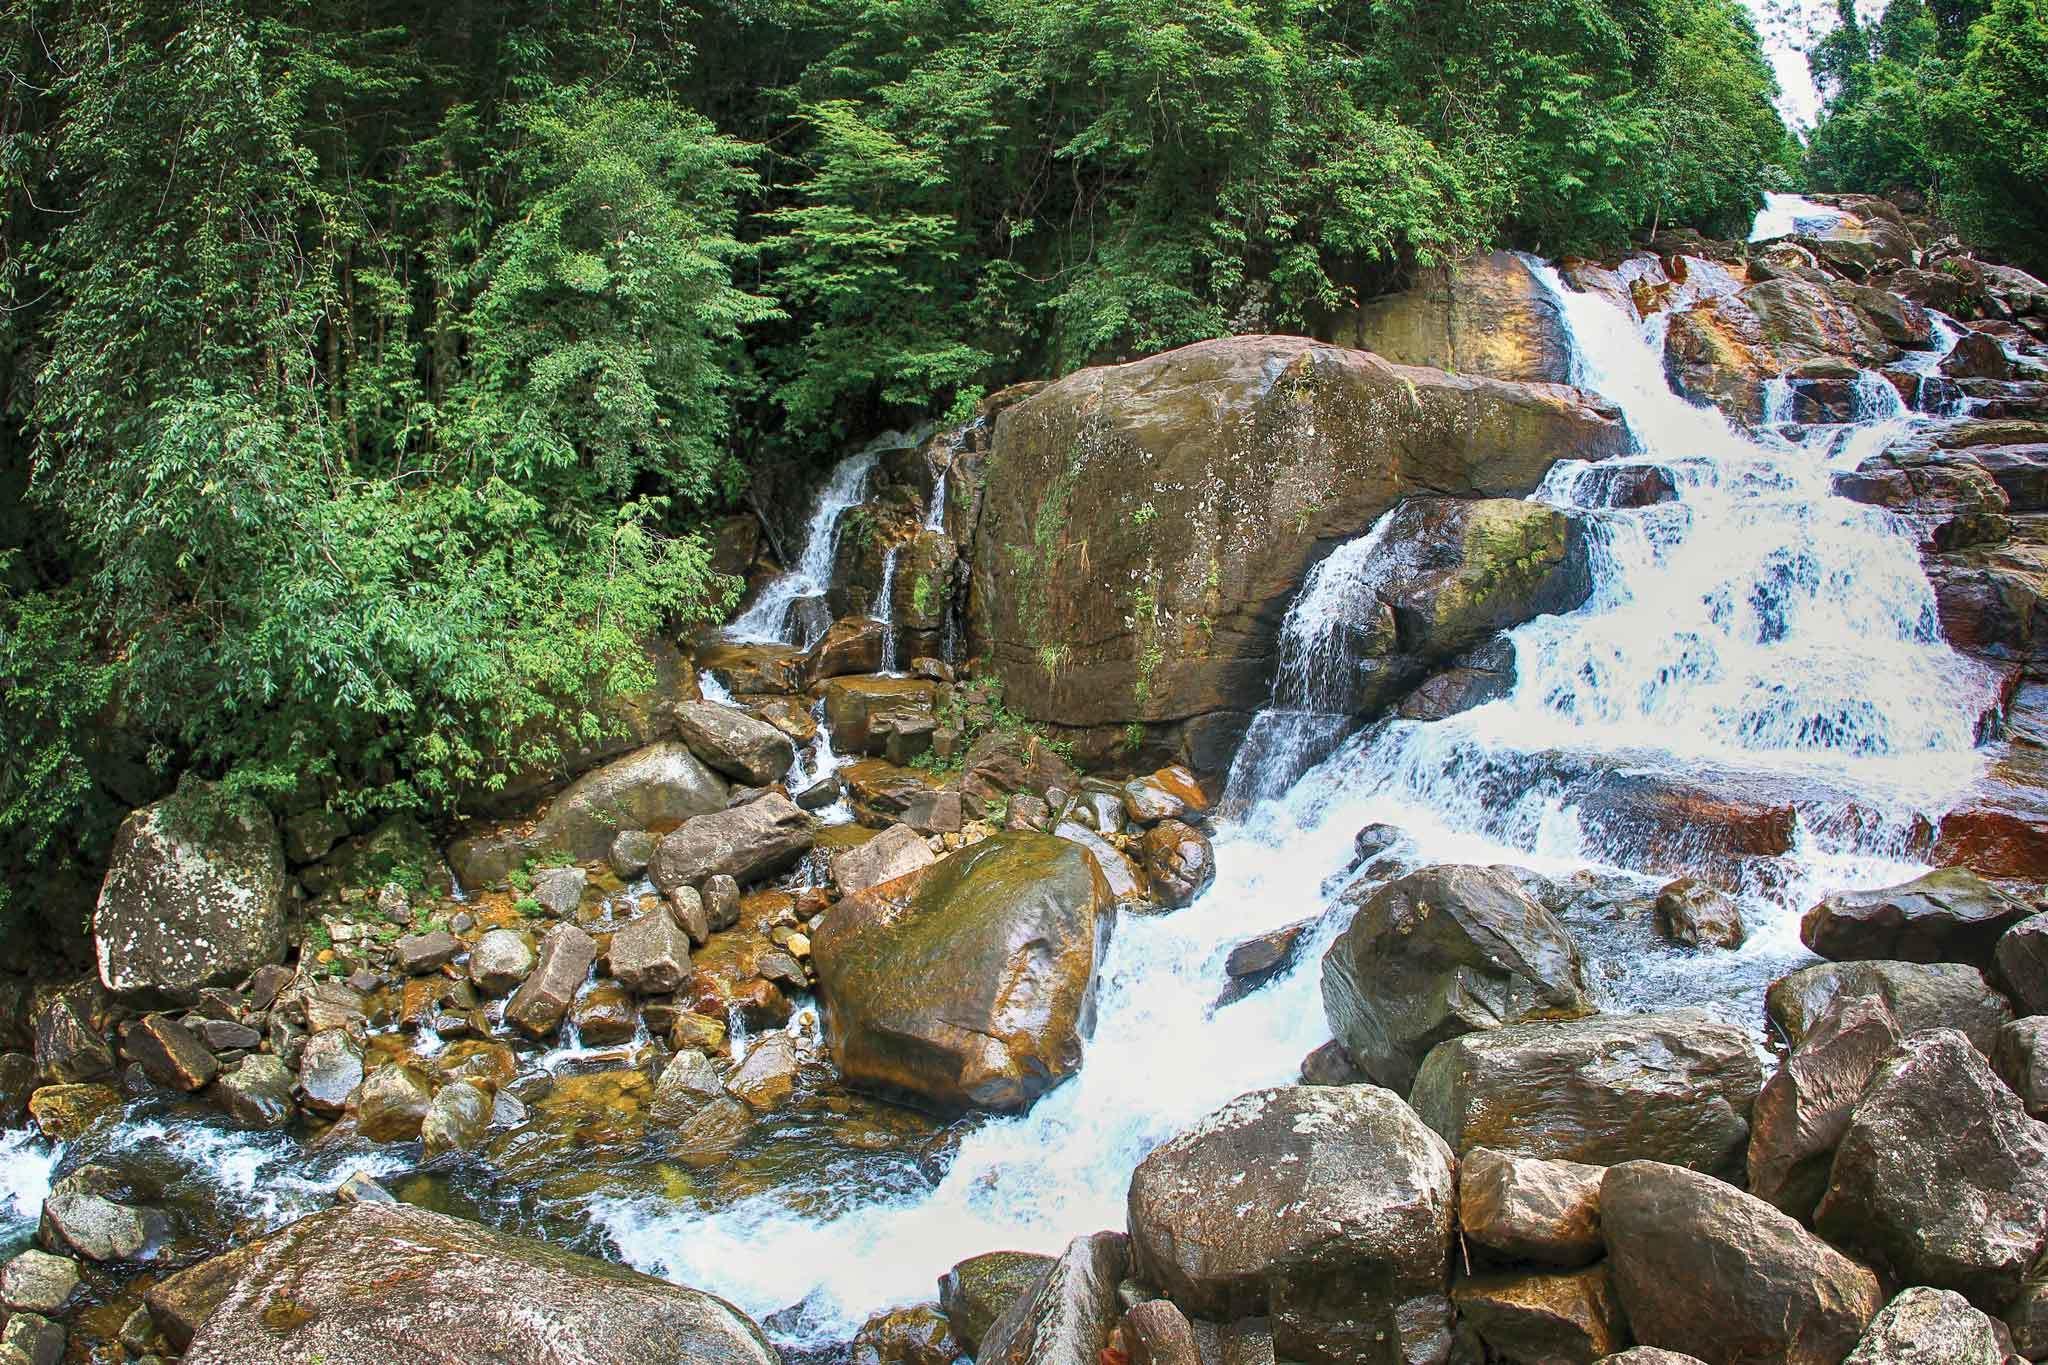 The fascinating biodiversity of Sinharaja